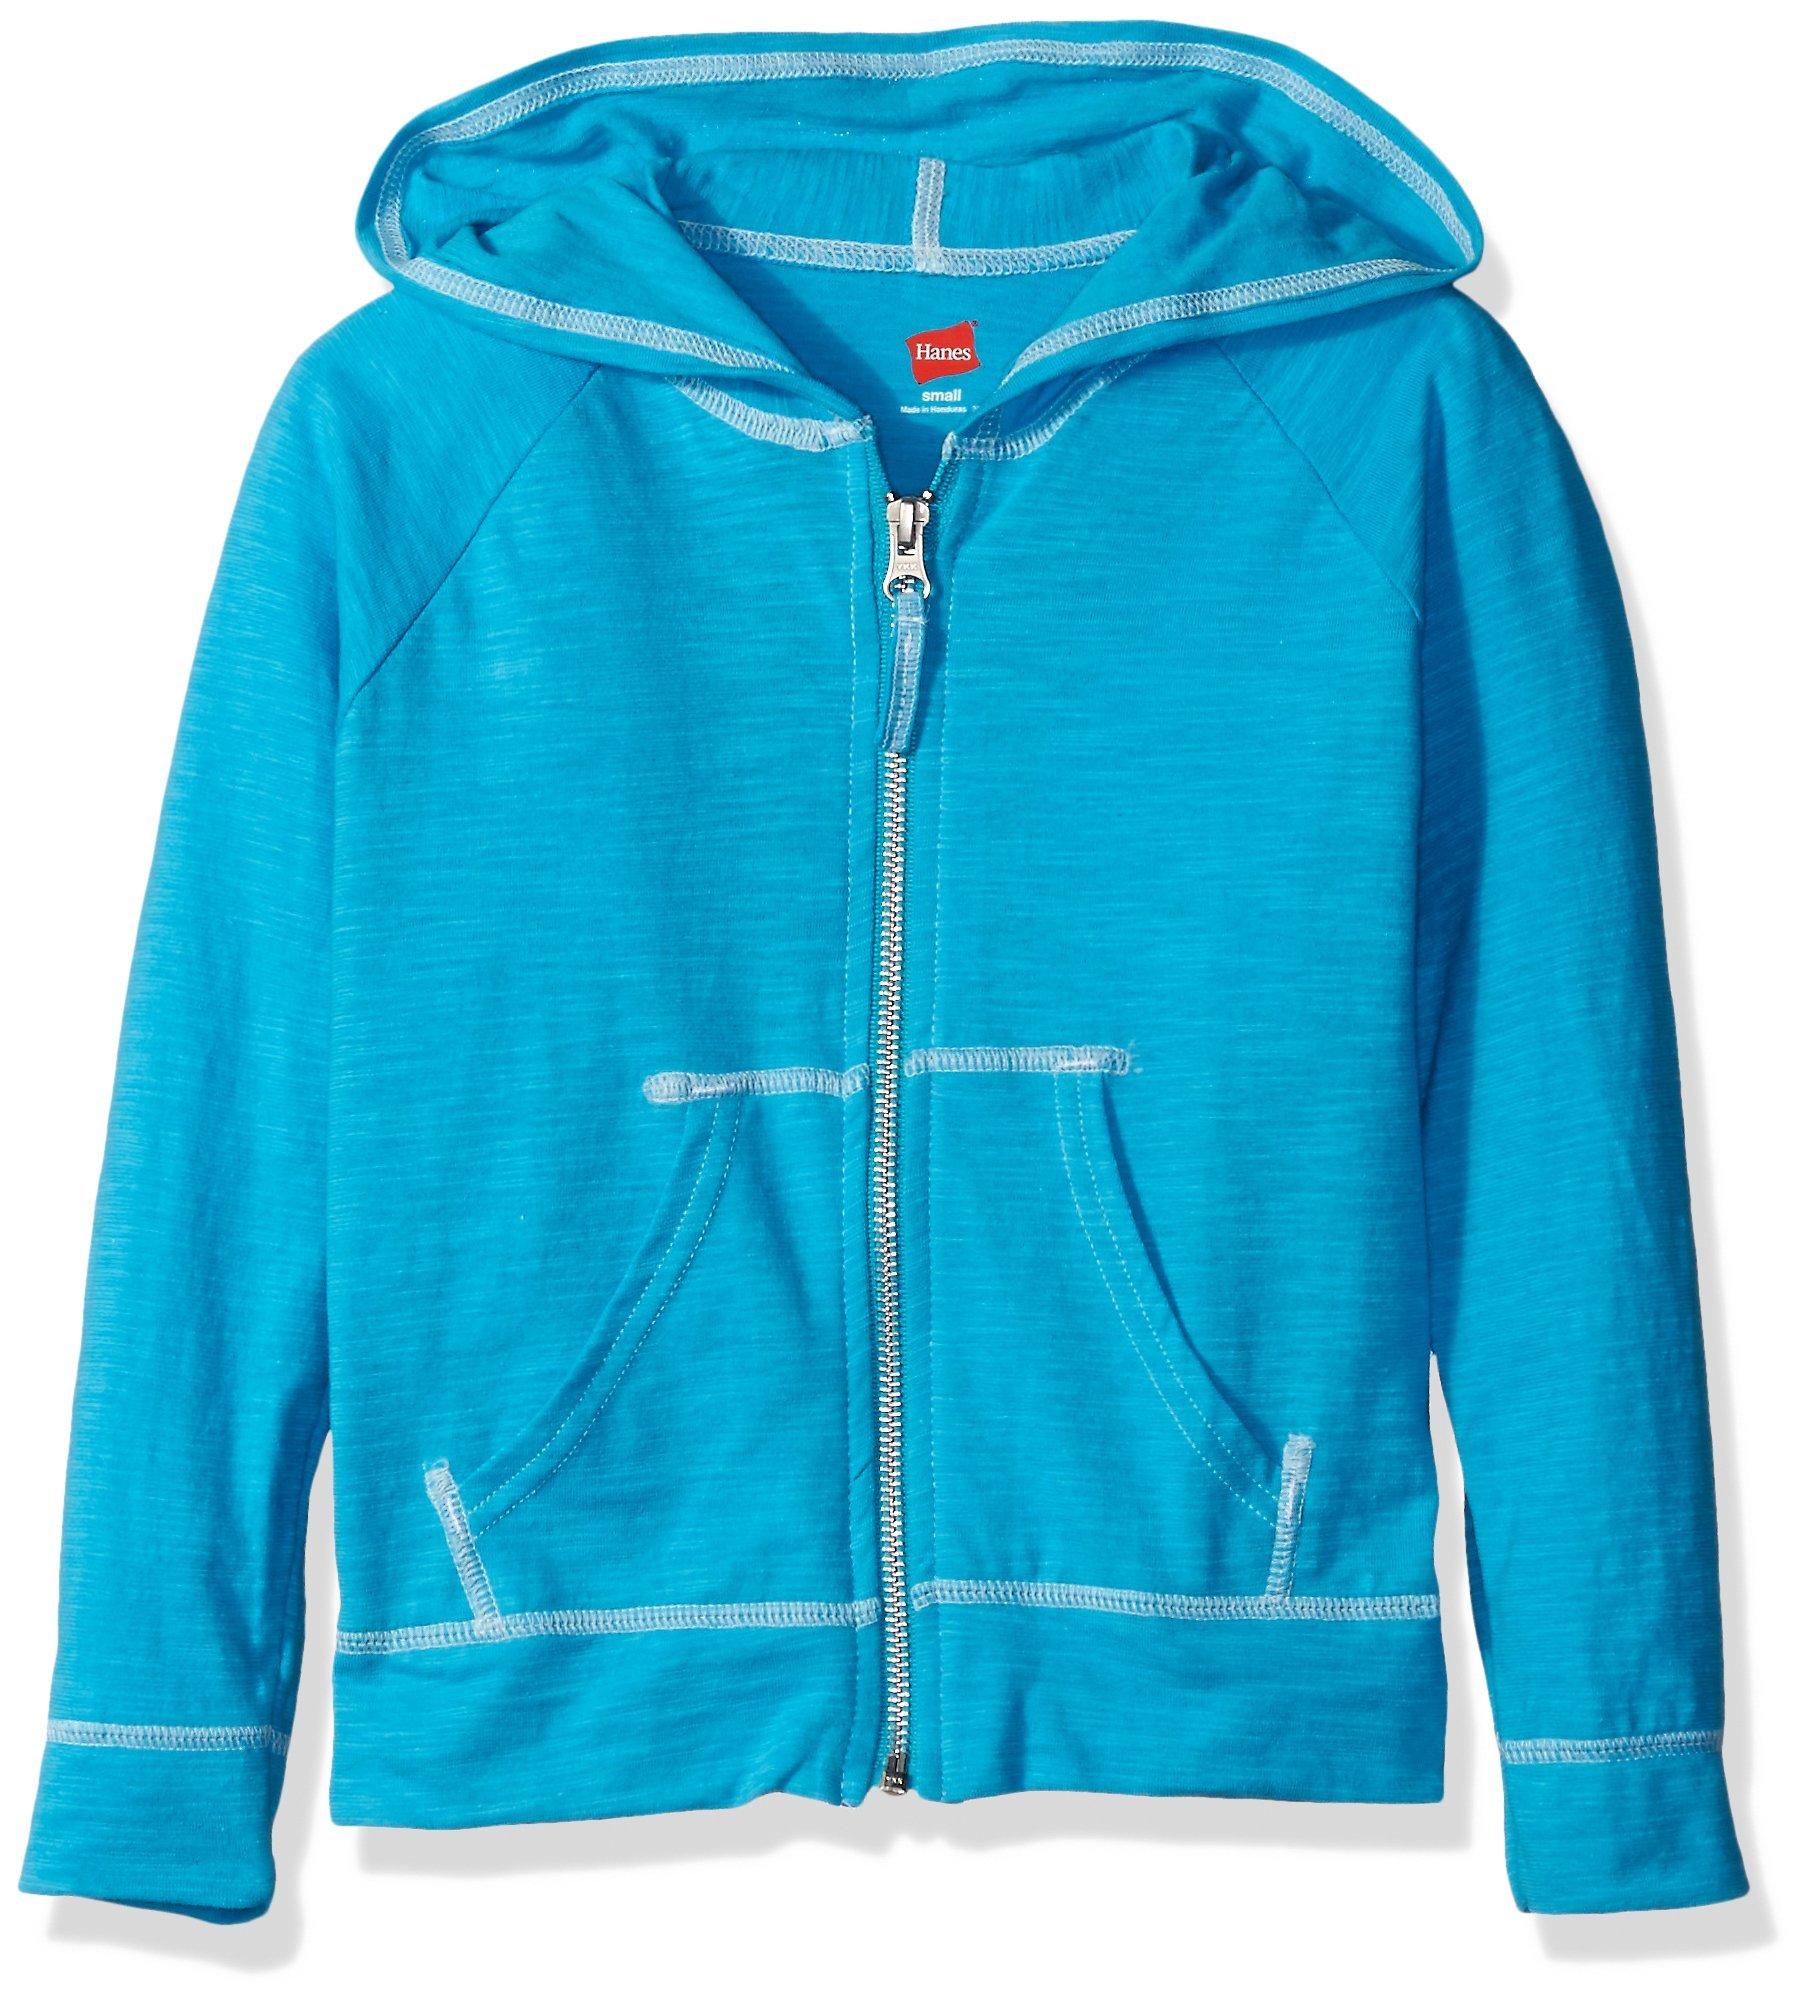 Hanes Little Girls' Slub Jersey Full Zip Jacket, Process Blue, Large